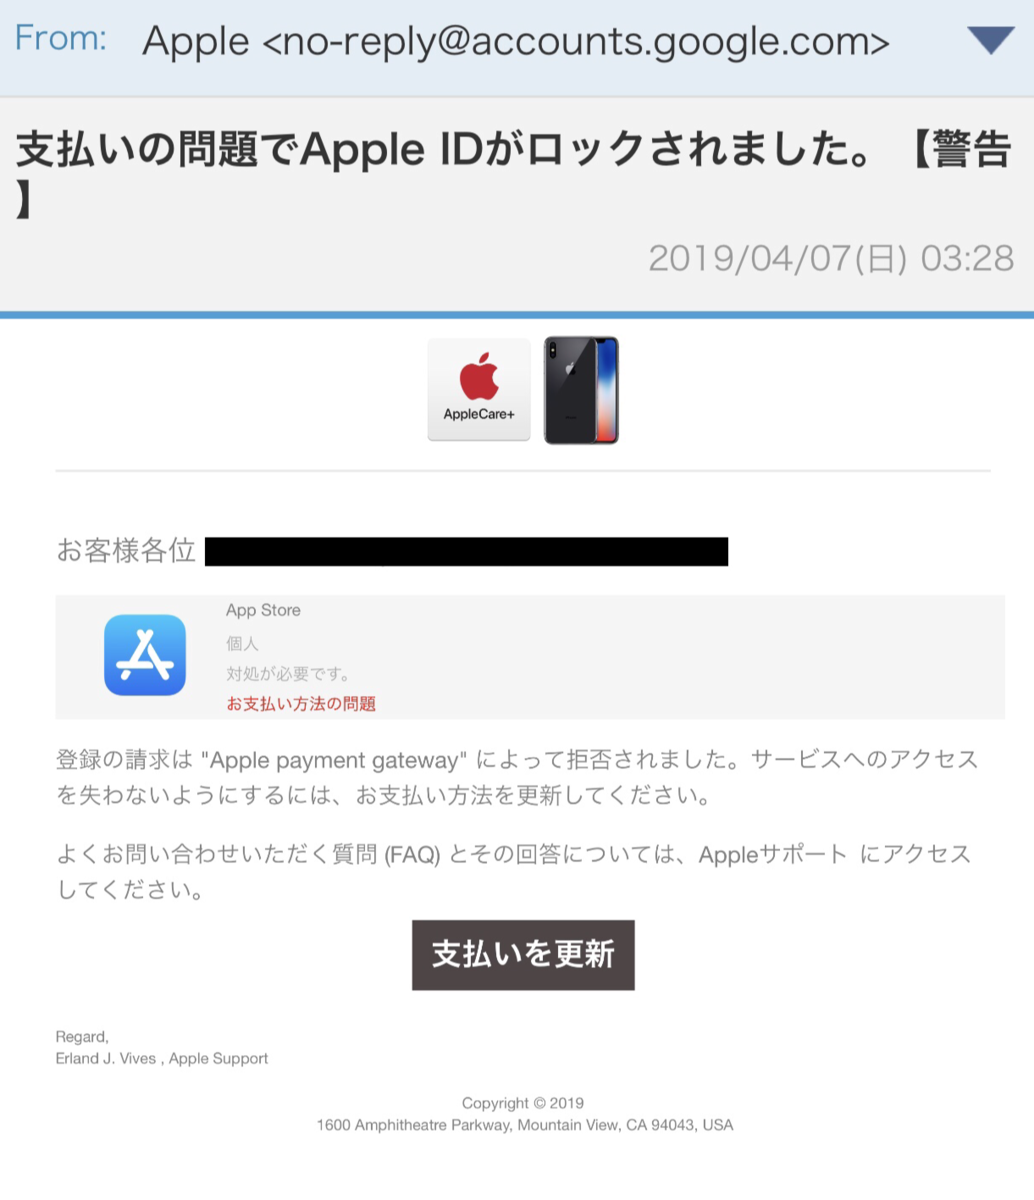 f:id:hirohito6001:20190415094614p:plain